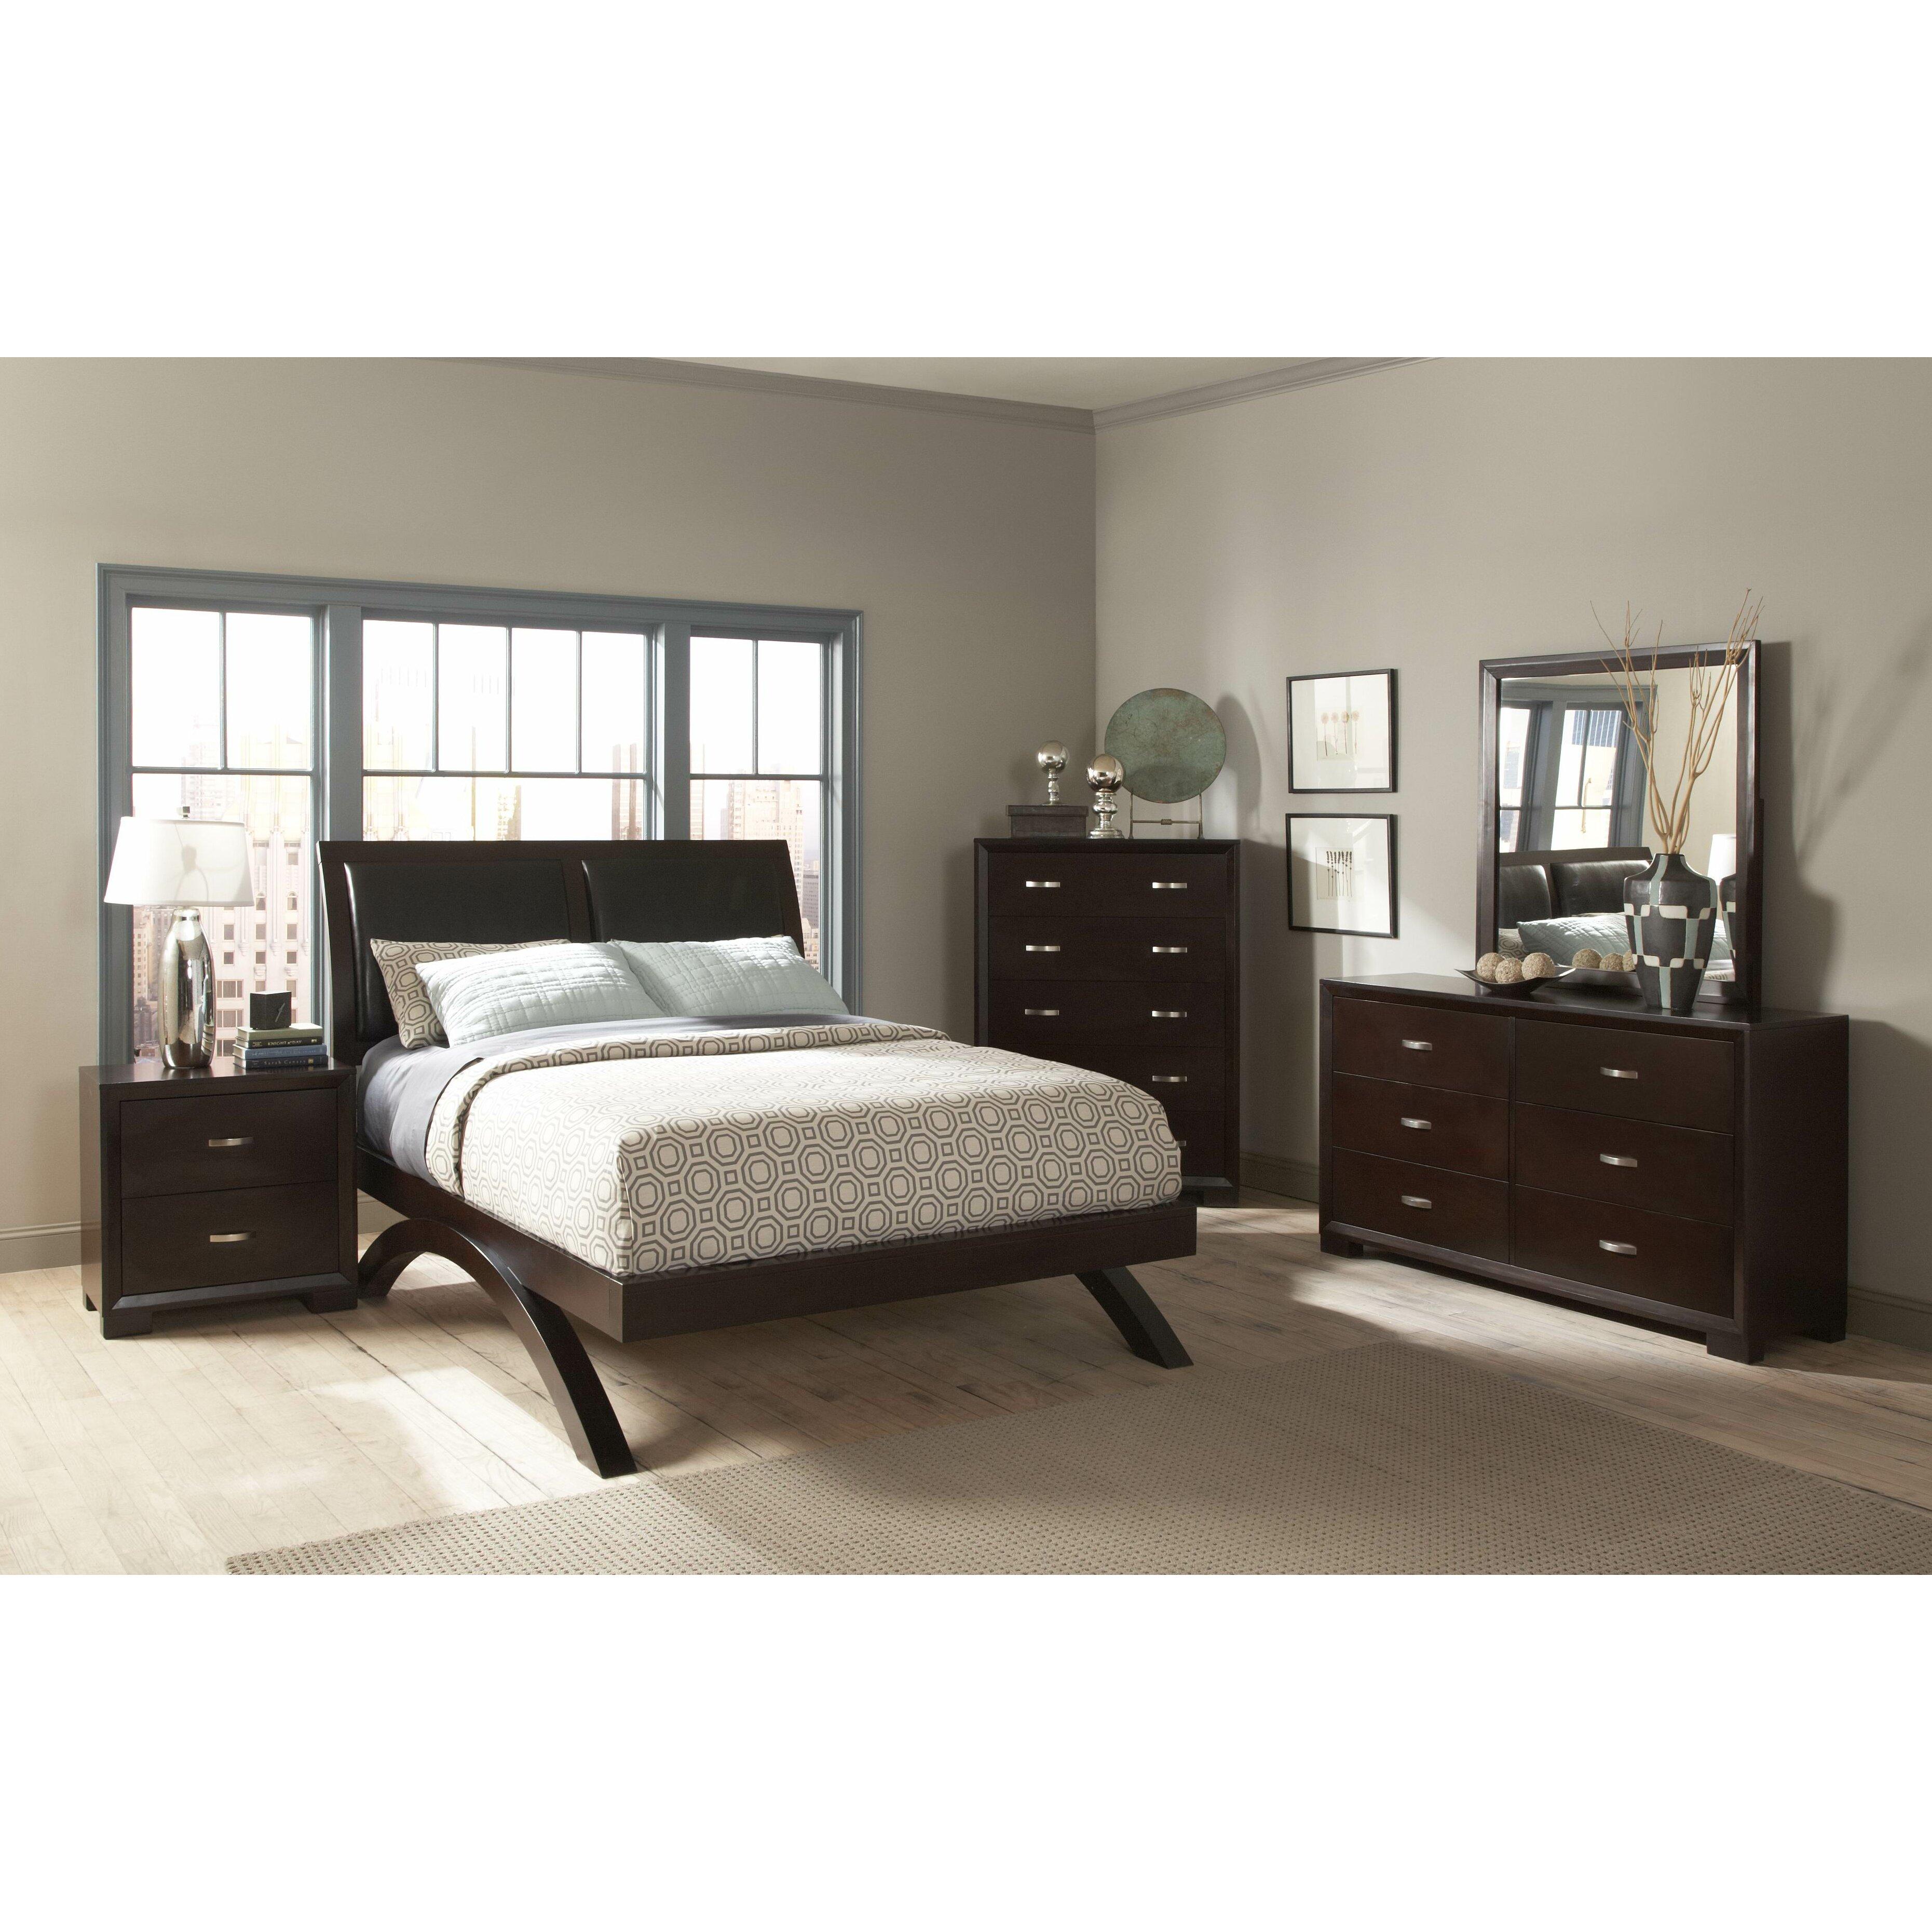 Woodhaven Hill 1313 Series Platform Customizable Bedroom